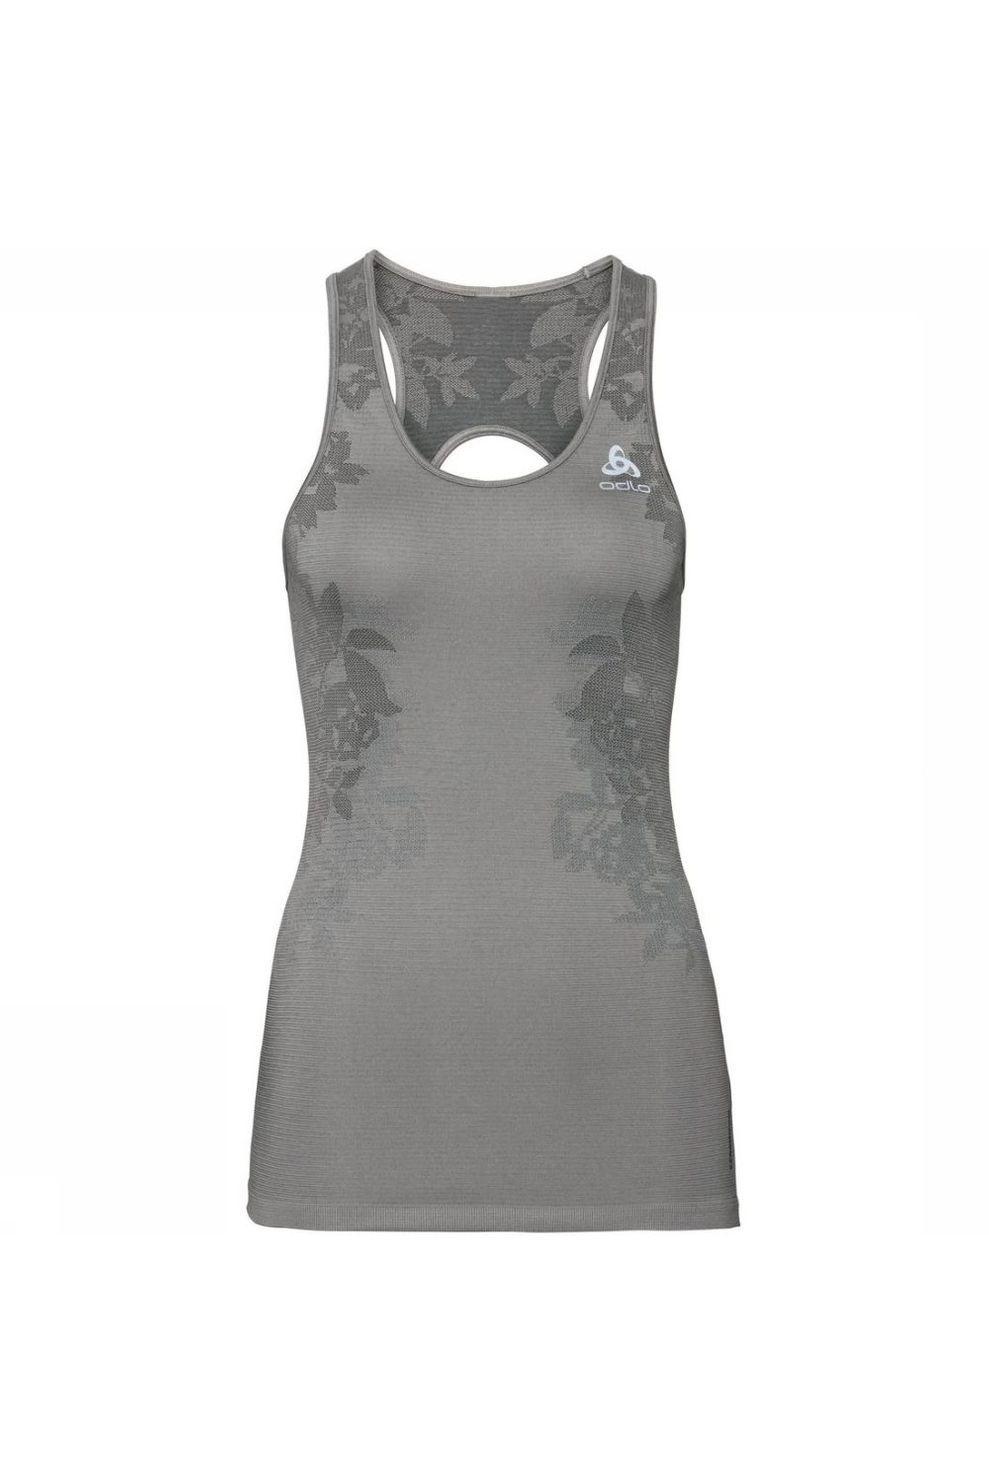 Odlo T-Shirt Ceramicool Blackcomb voor dames - Grijs - Maten: XS, M